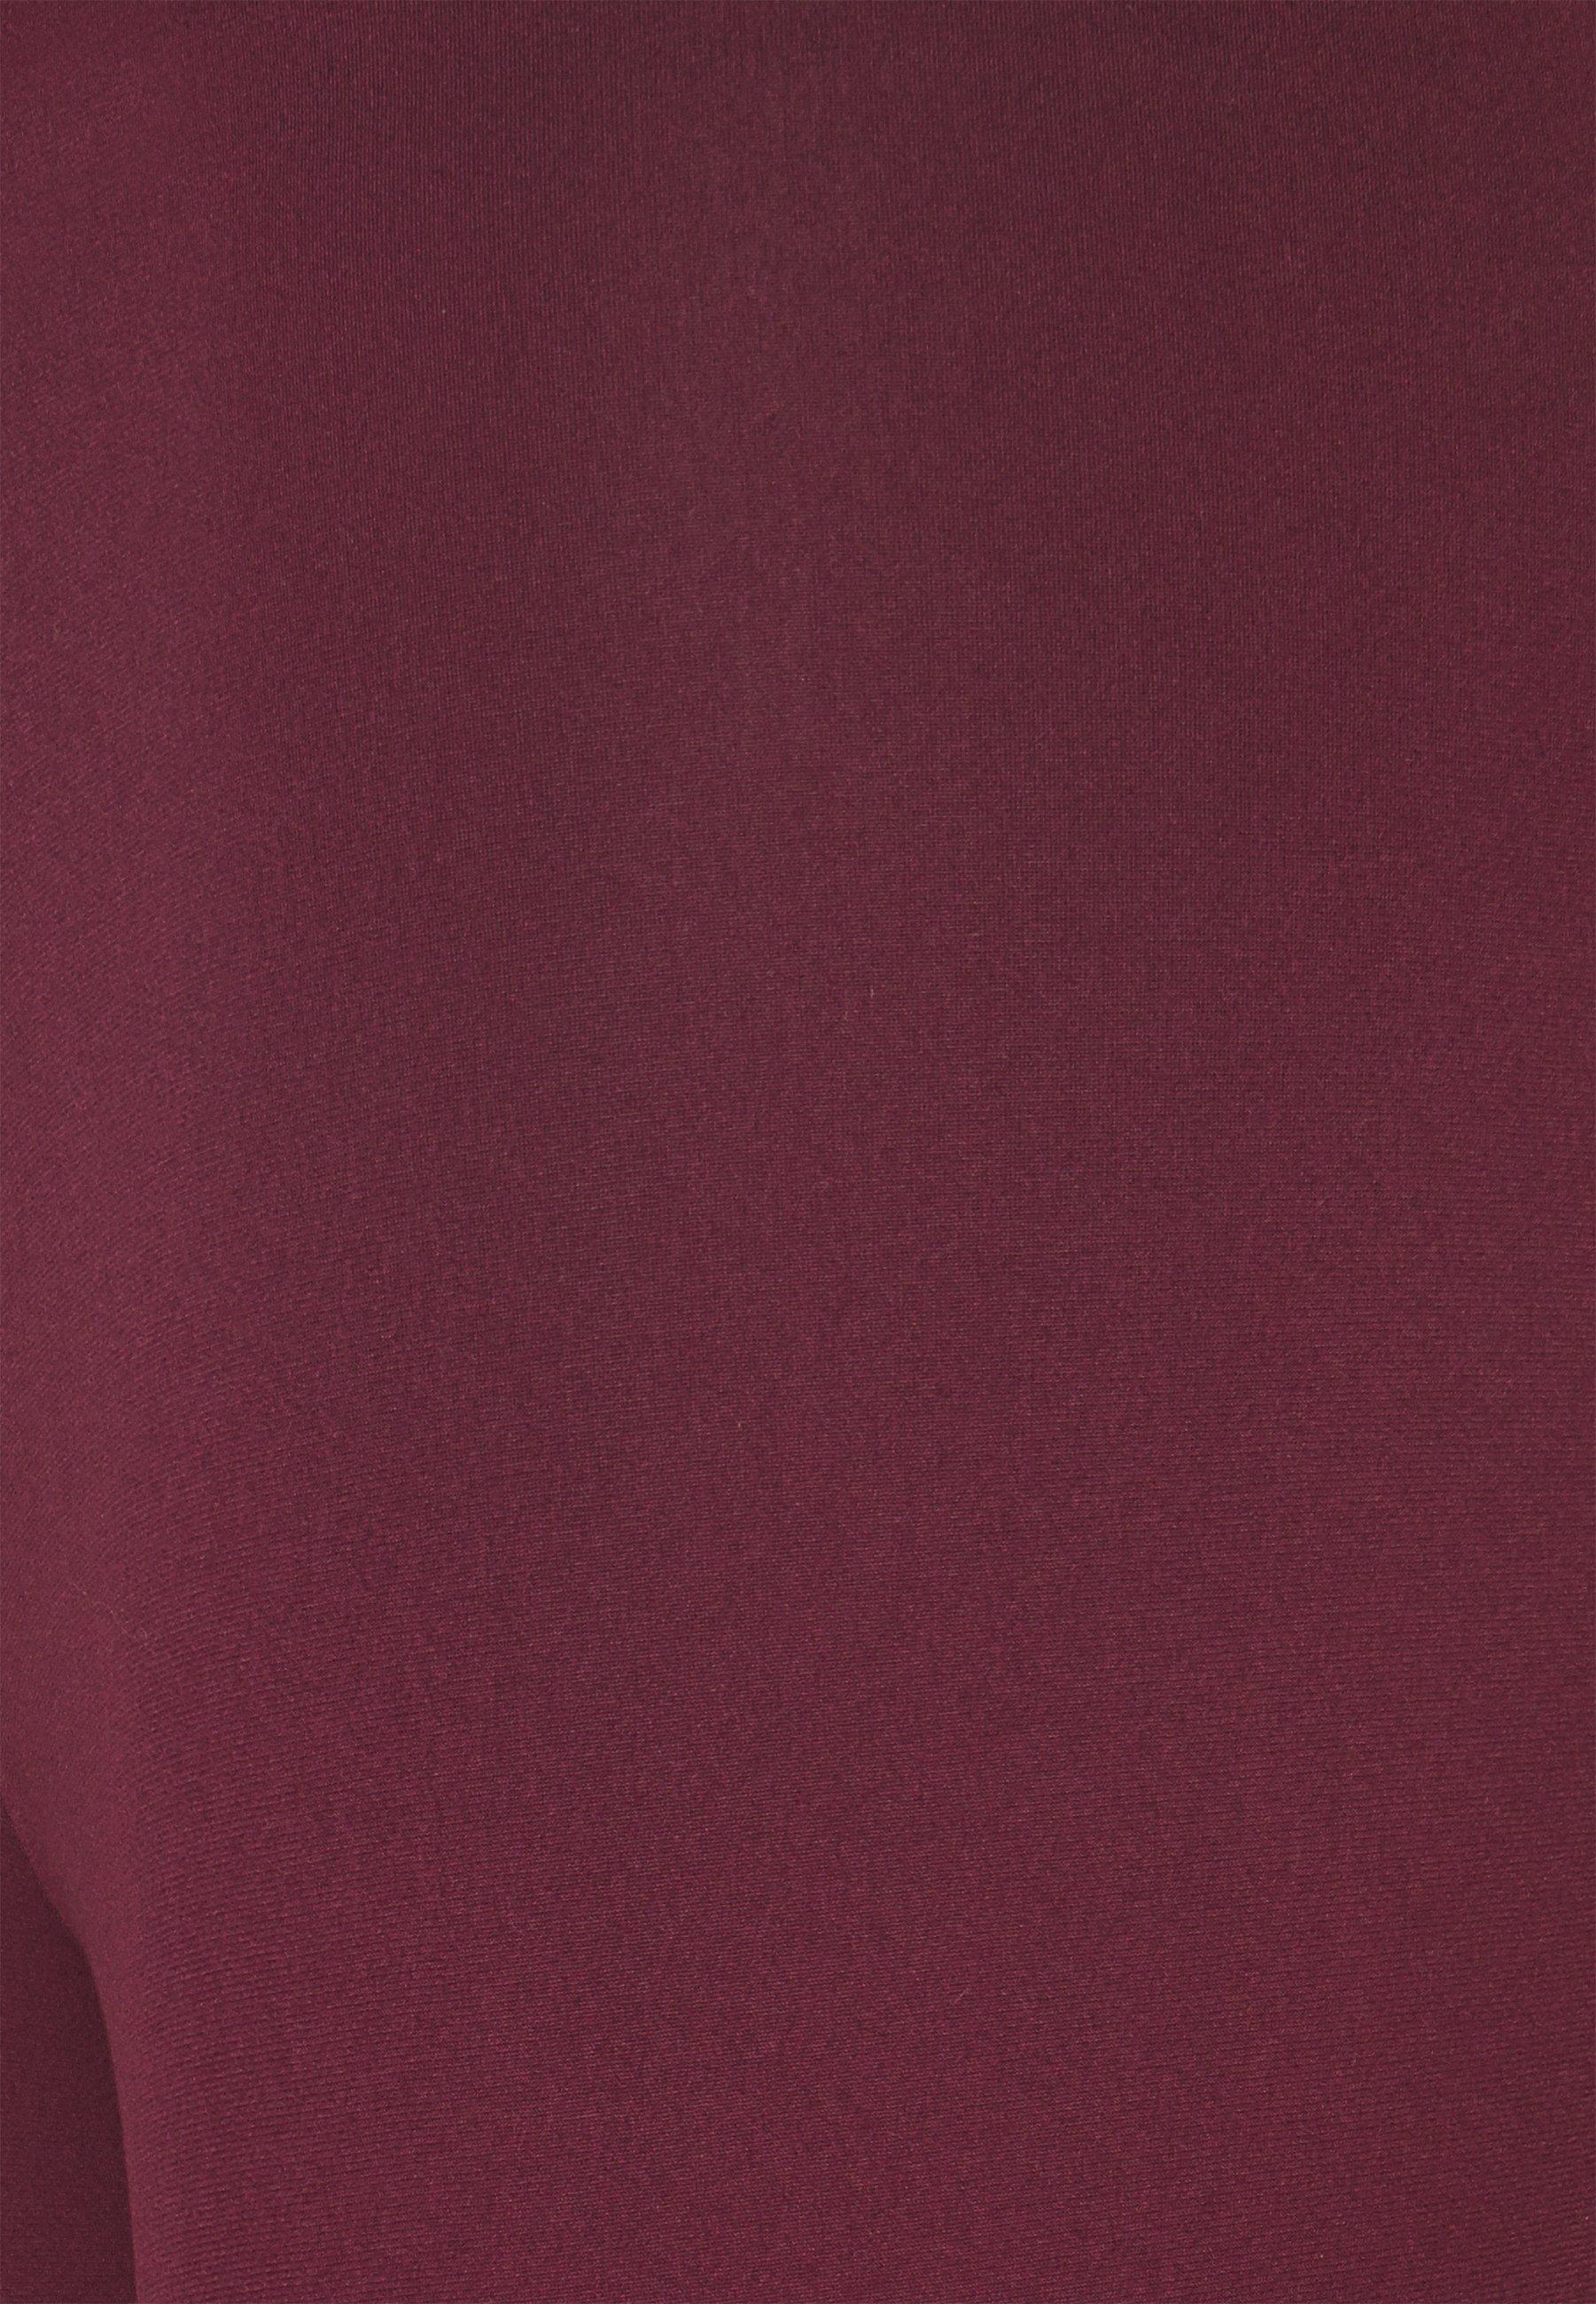 adidas Originals GRAPHICS HIGH RISE REGULAR TIGHTS